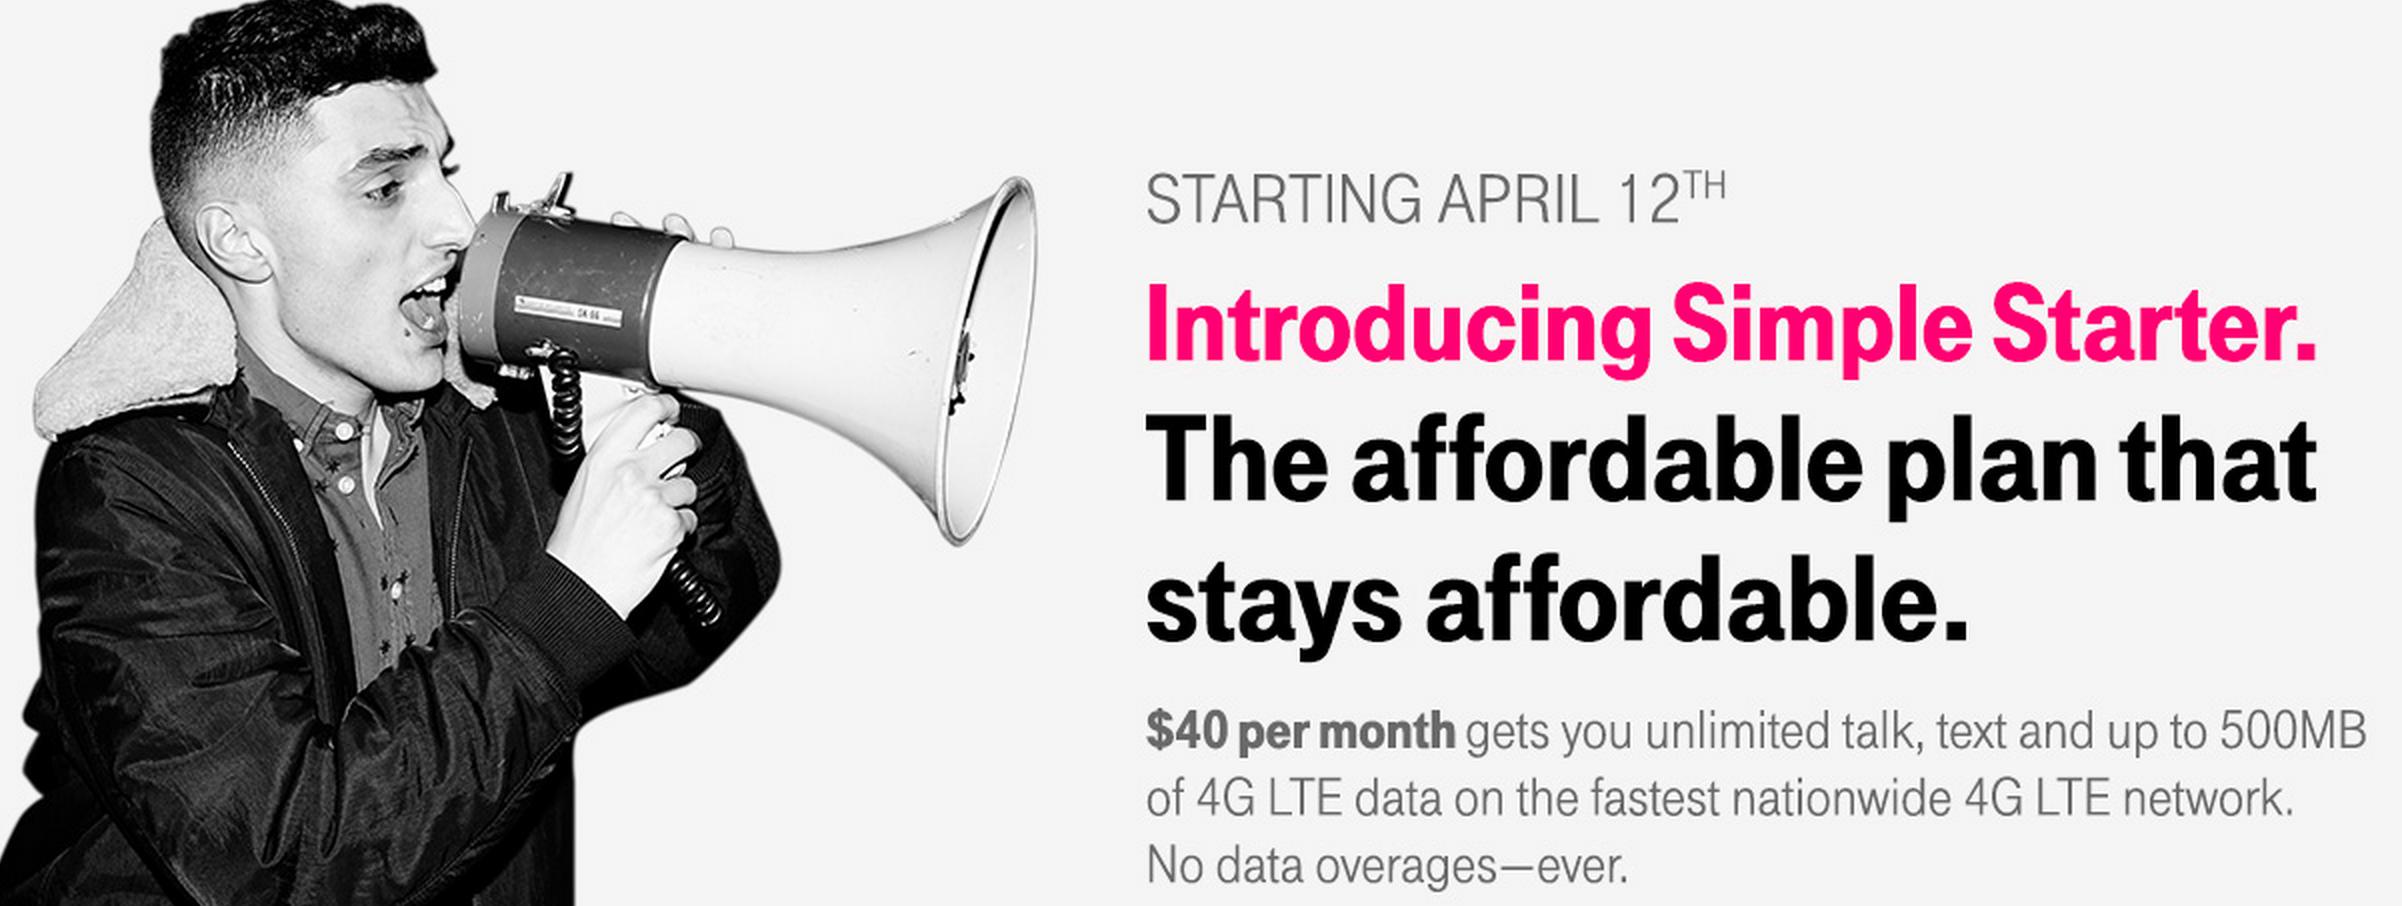 T-Mobile-Simple-Starter